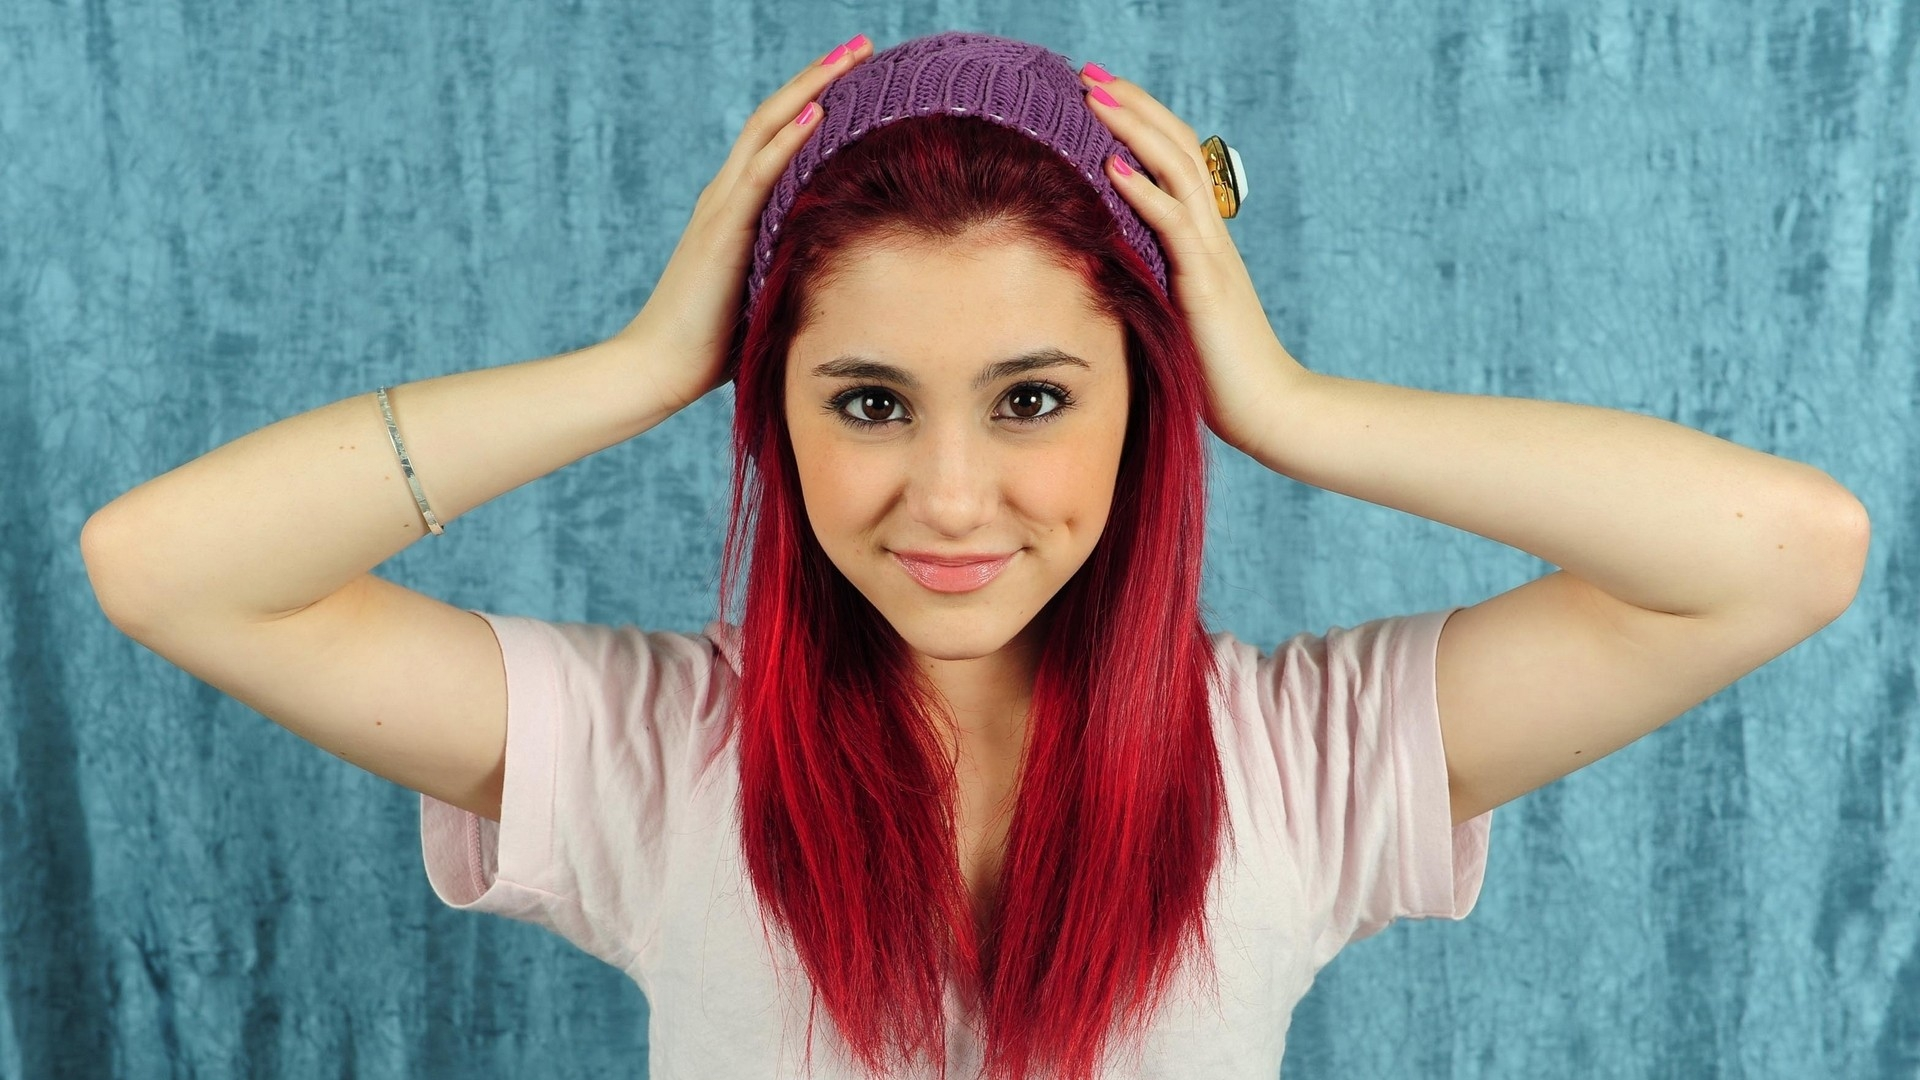 Download Wallpaper 1920x1080 Ariana Grande Hair Color Creativity